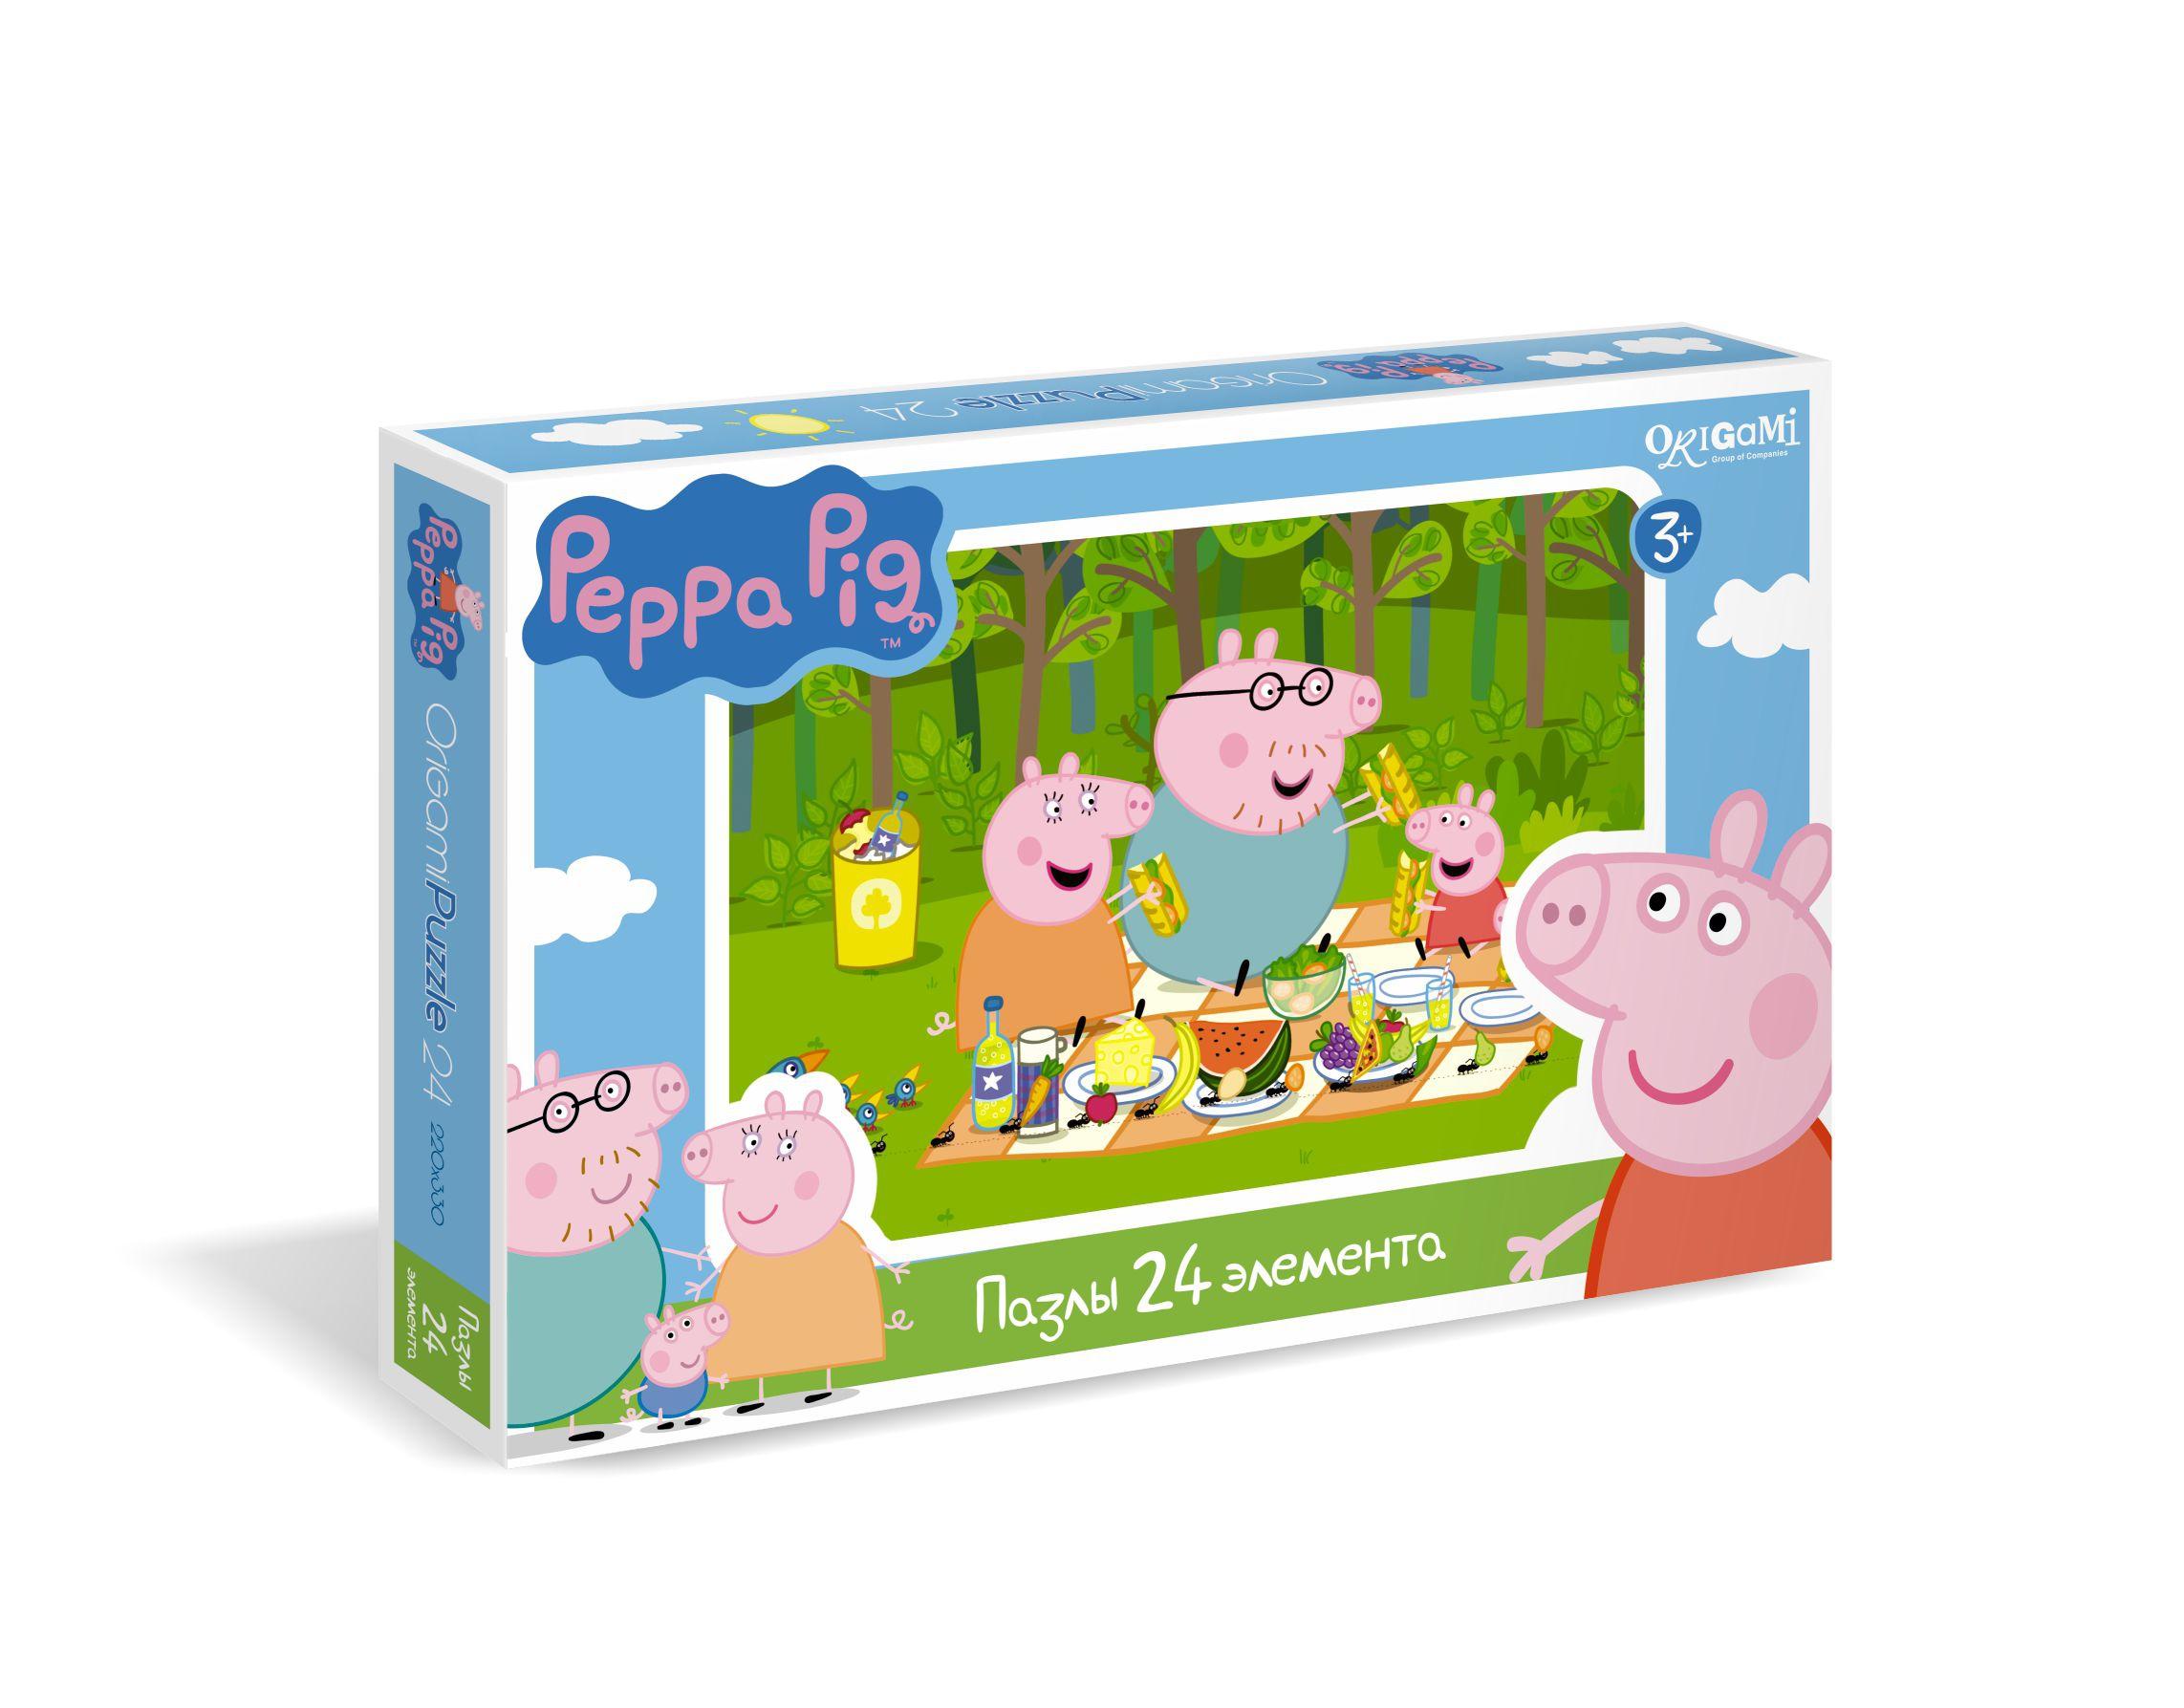 Пазлы Peppa Pig Пикник origami пазл свинка пеппа 25 деталей origami